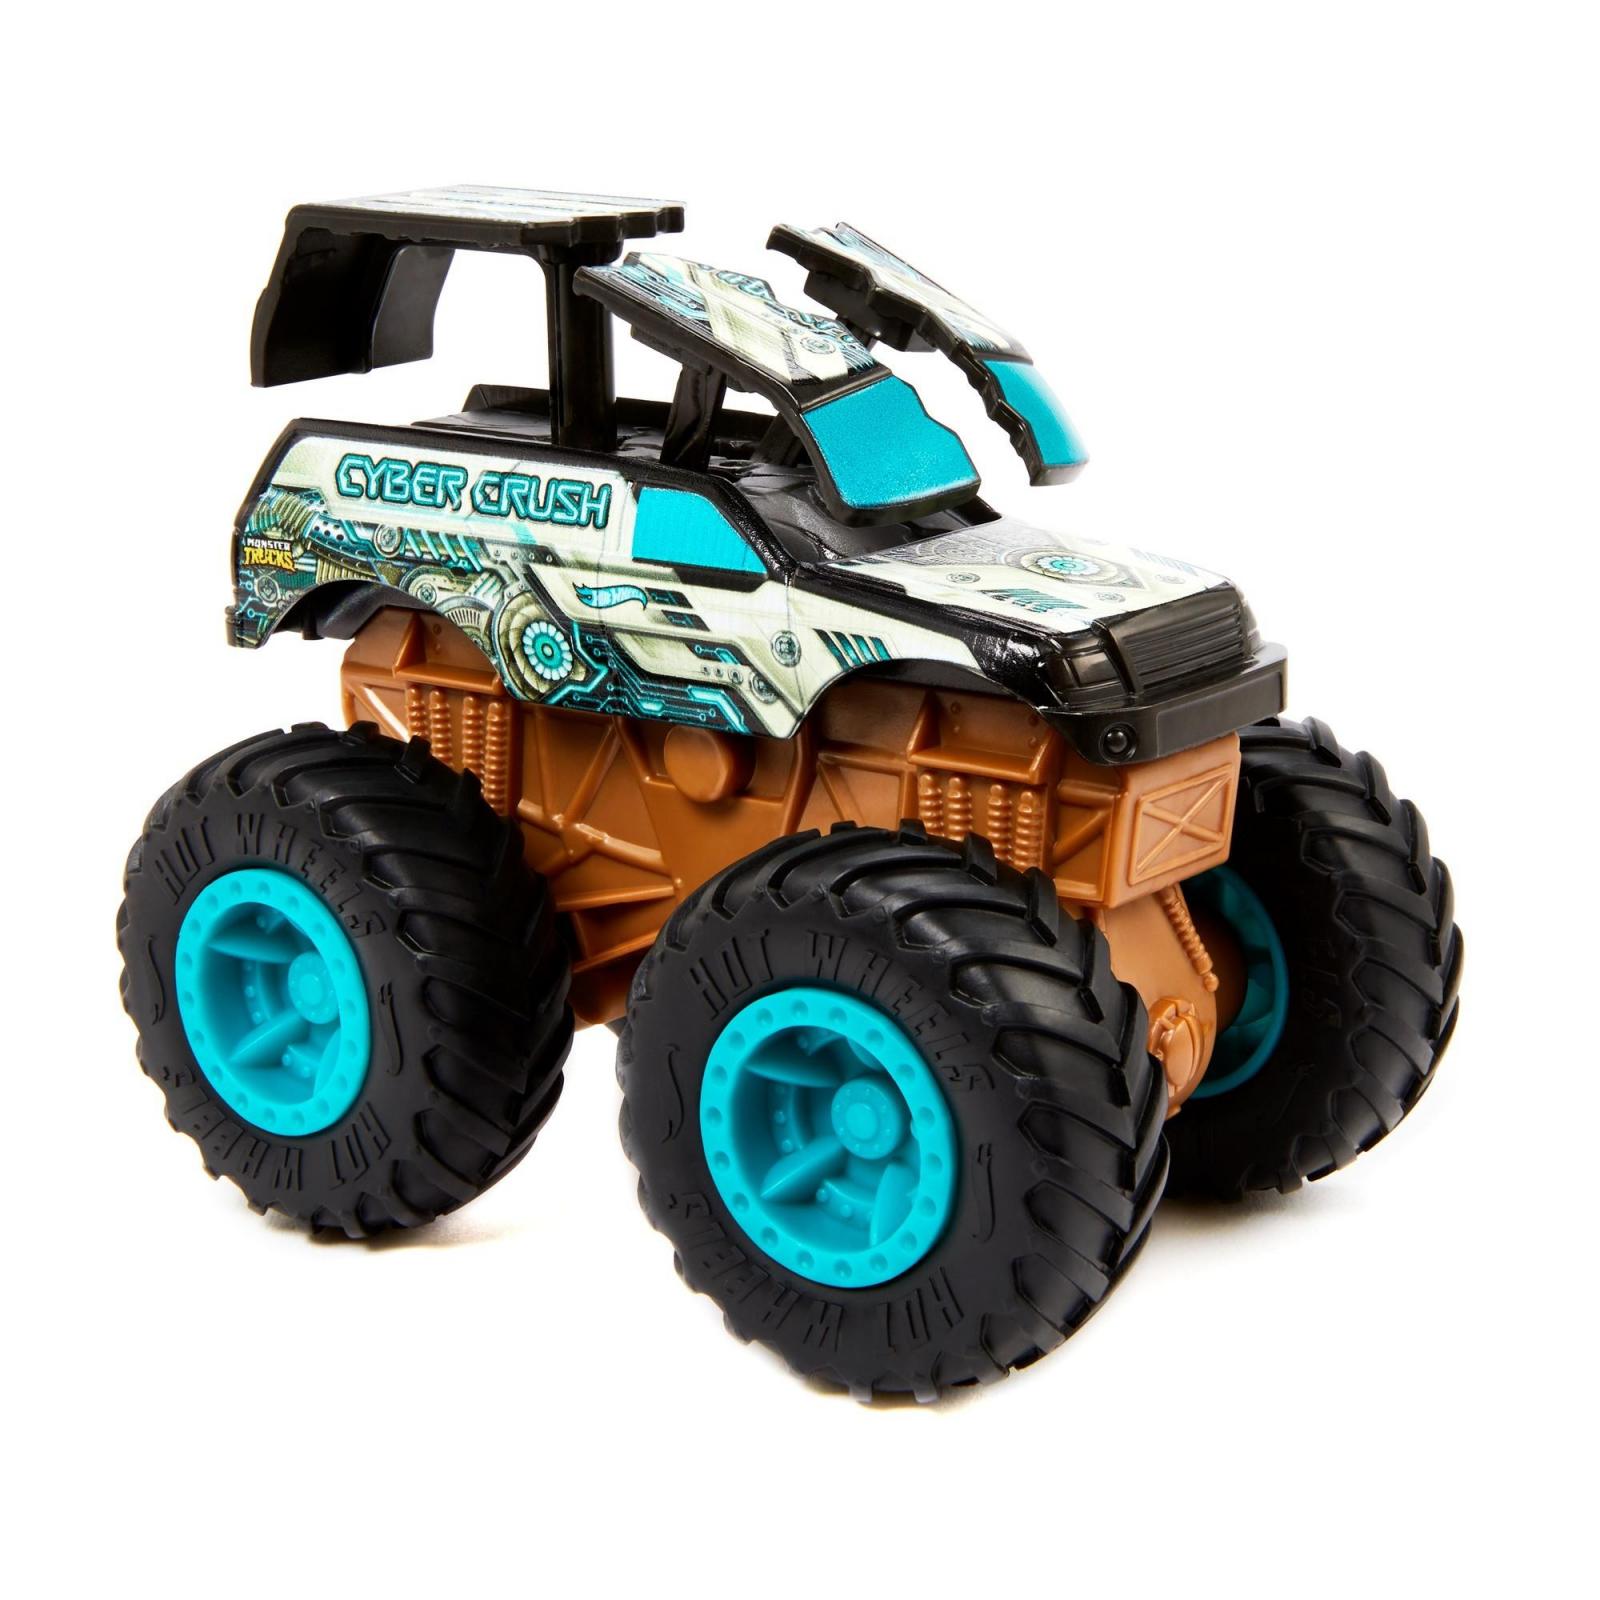 Hot Wheels Bash-Ups Monster Truck Big Wheels - Cyber Crush